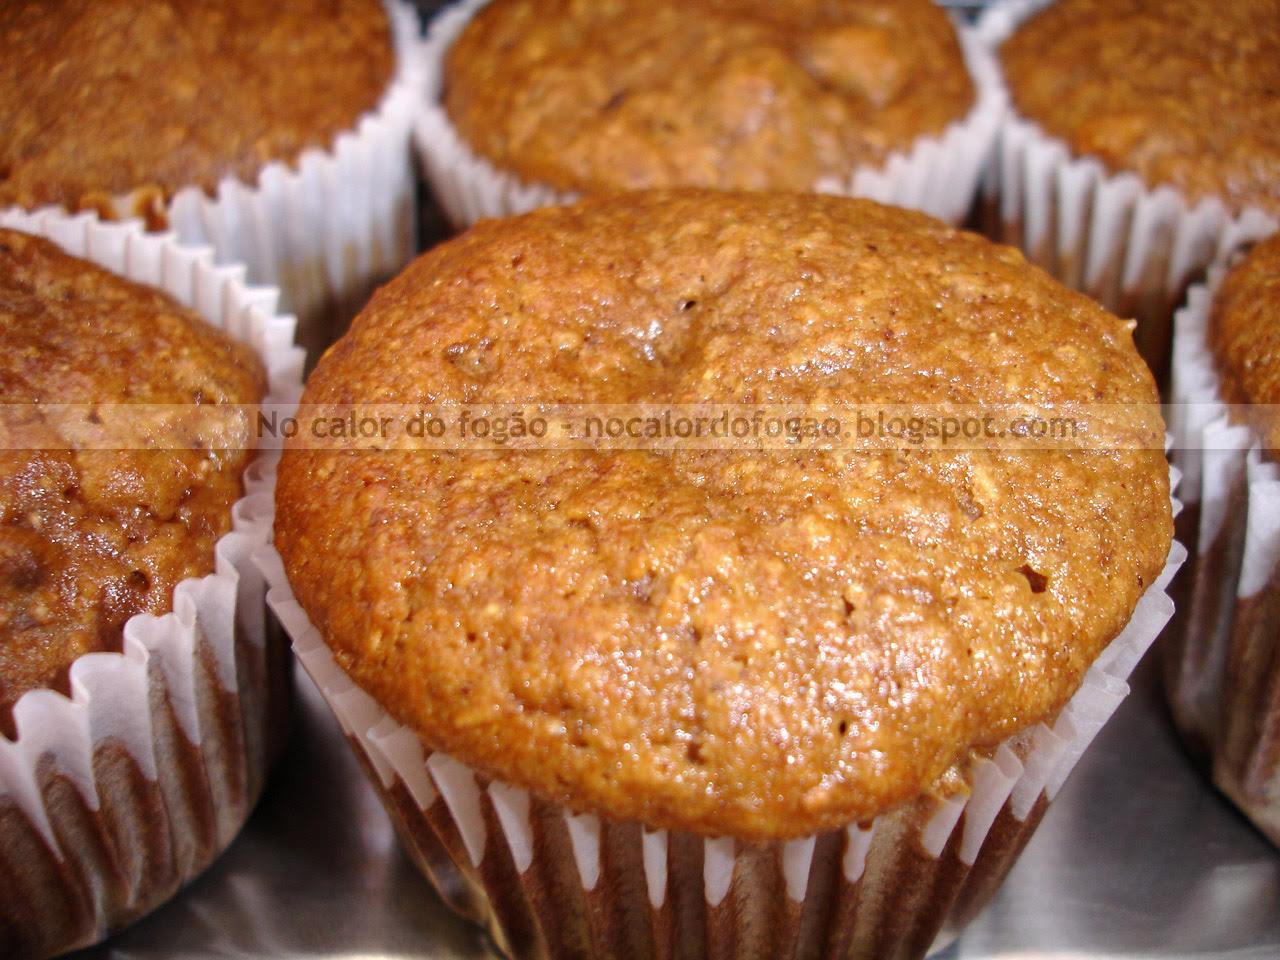 Muffin integral de banana, nozes e passas